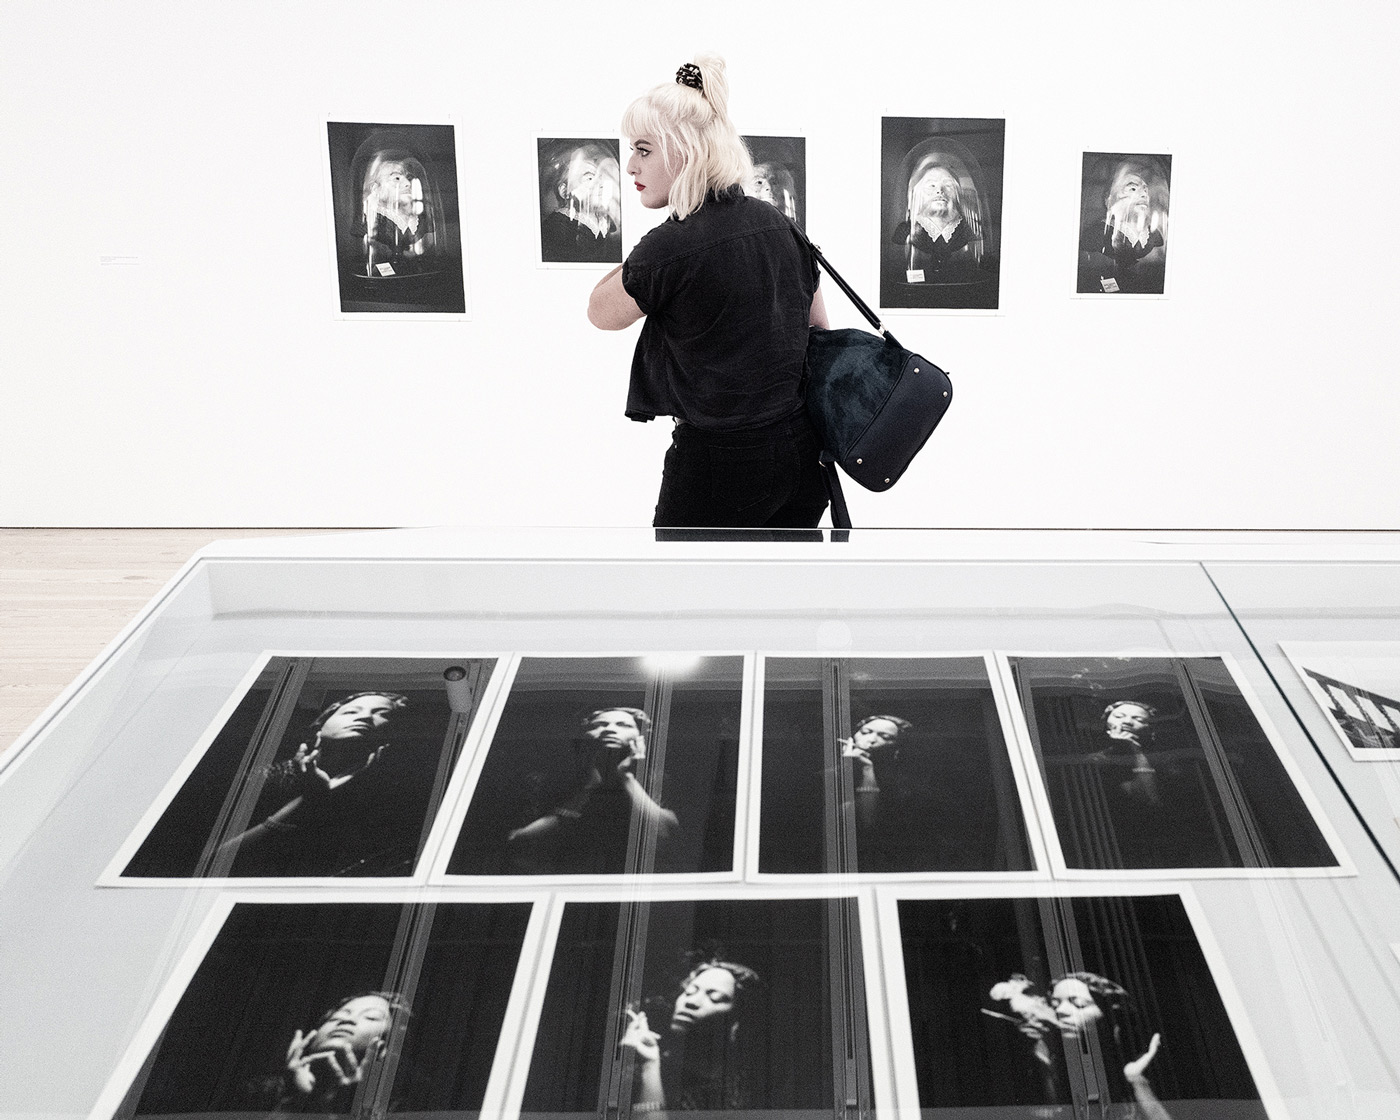 William-Bullard_USA_Pictures-at-an-Exhibition_02.jpeg